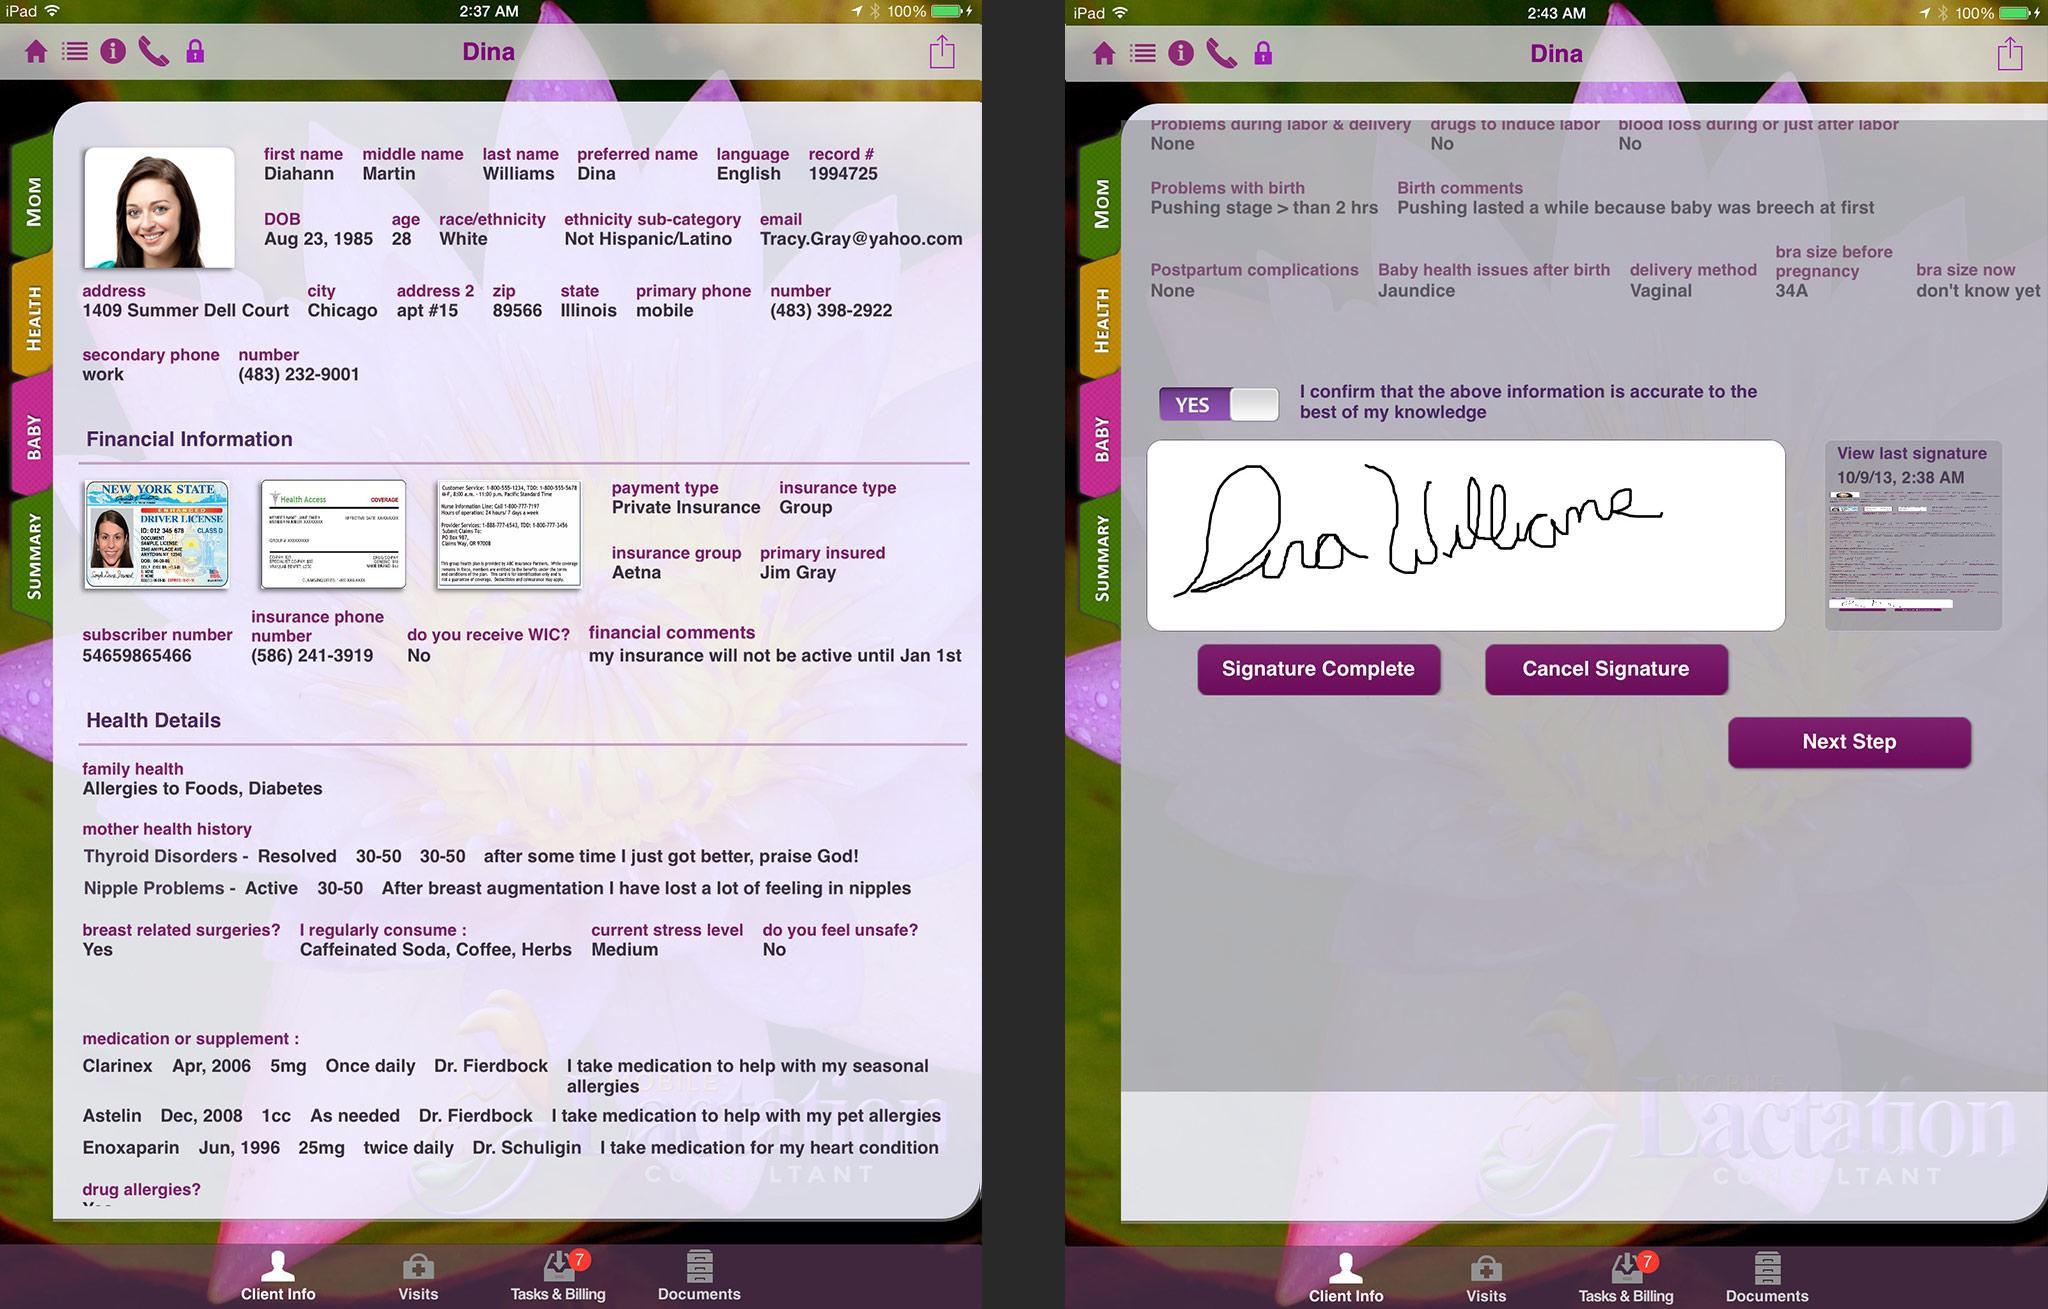 How To Buy Diclofenac Online Usa